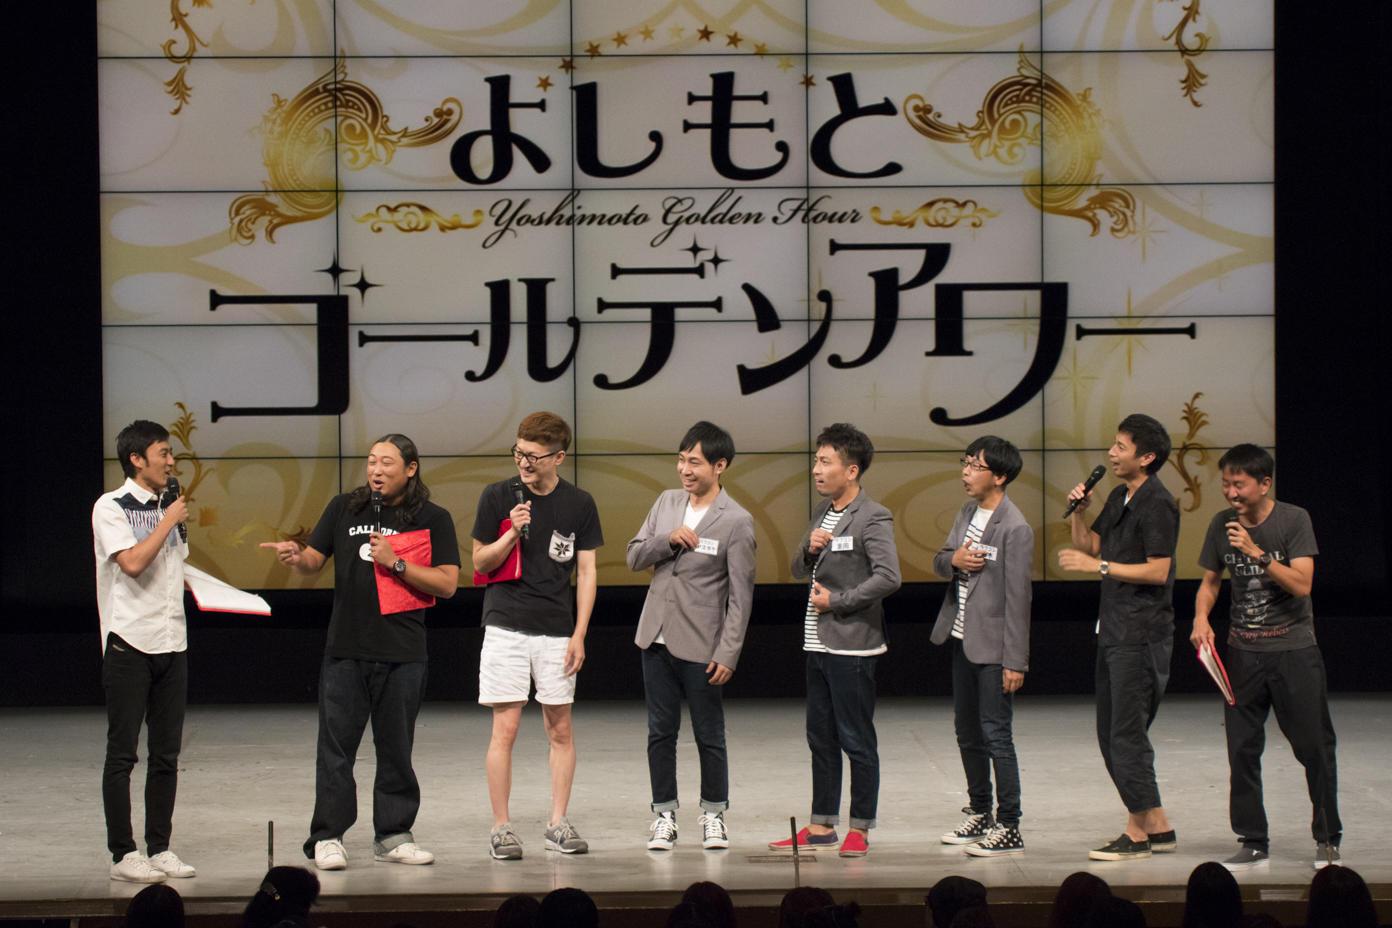 http://news.yoshimoto.co.jp/20160824232353-0edf0563045e5e0a0d156fe51777209c4b304669.jpg